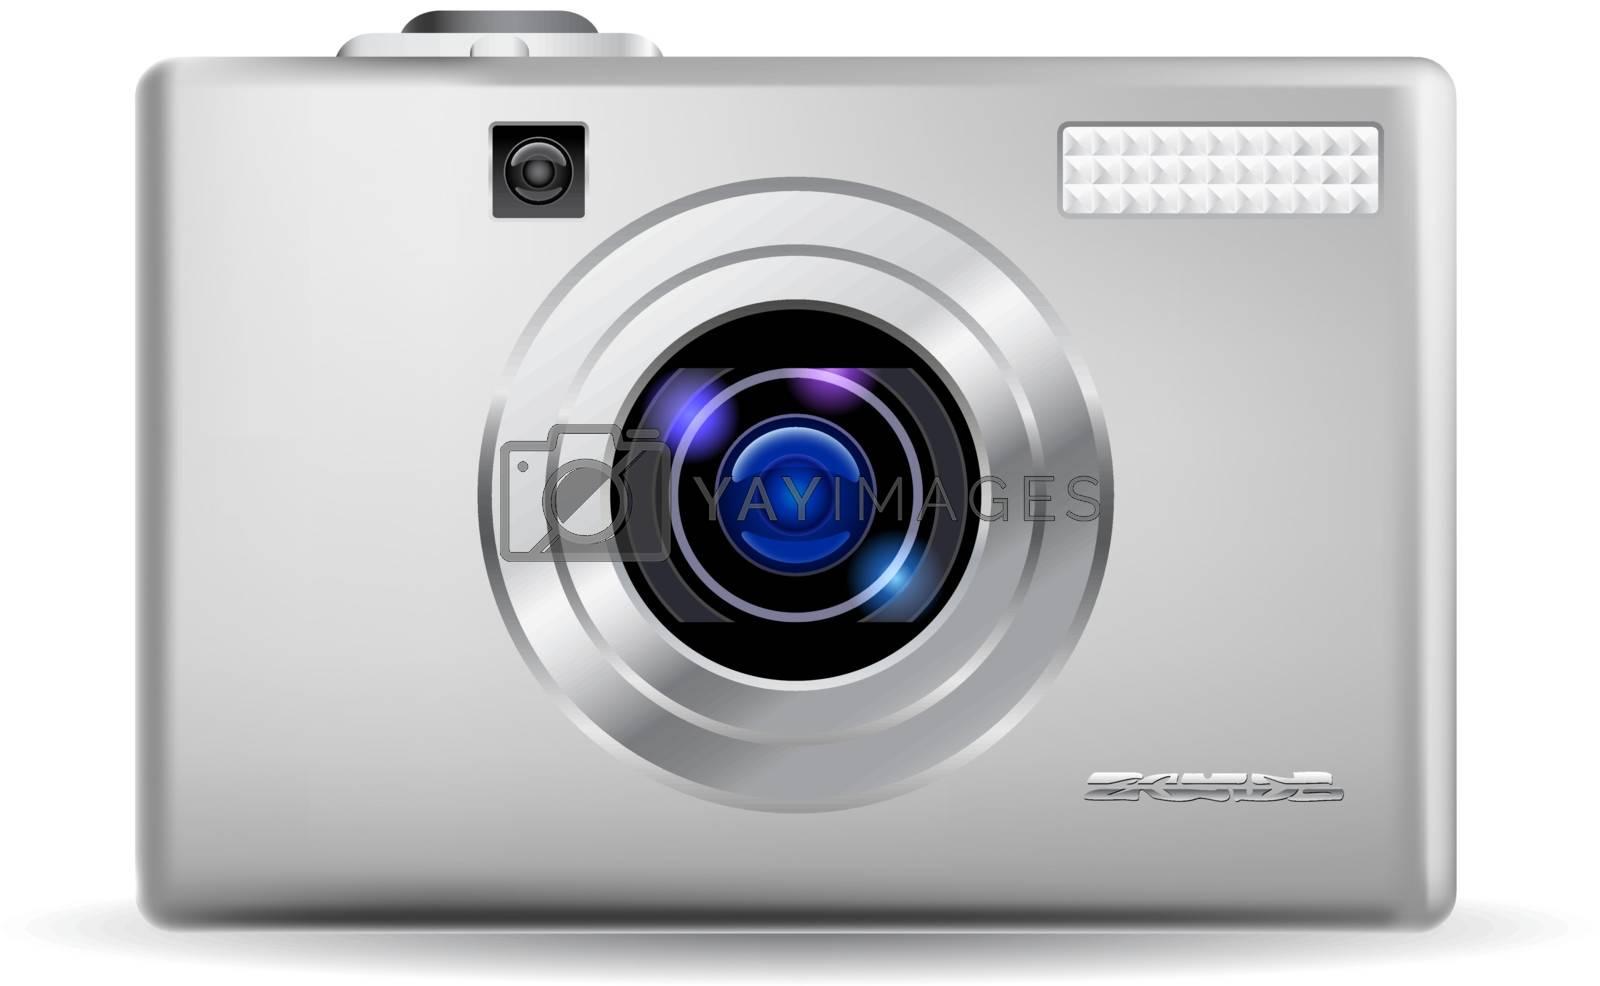 Simple digital camera. Illustration on white background